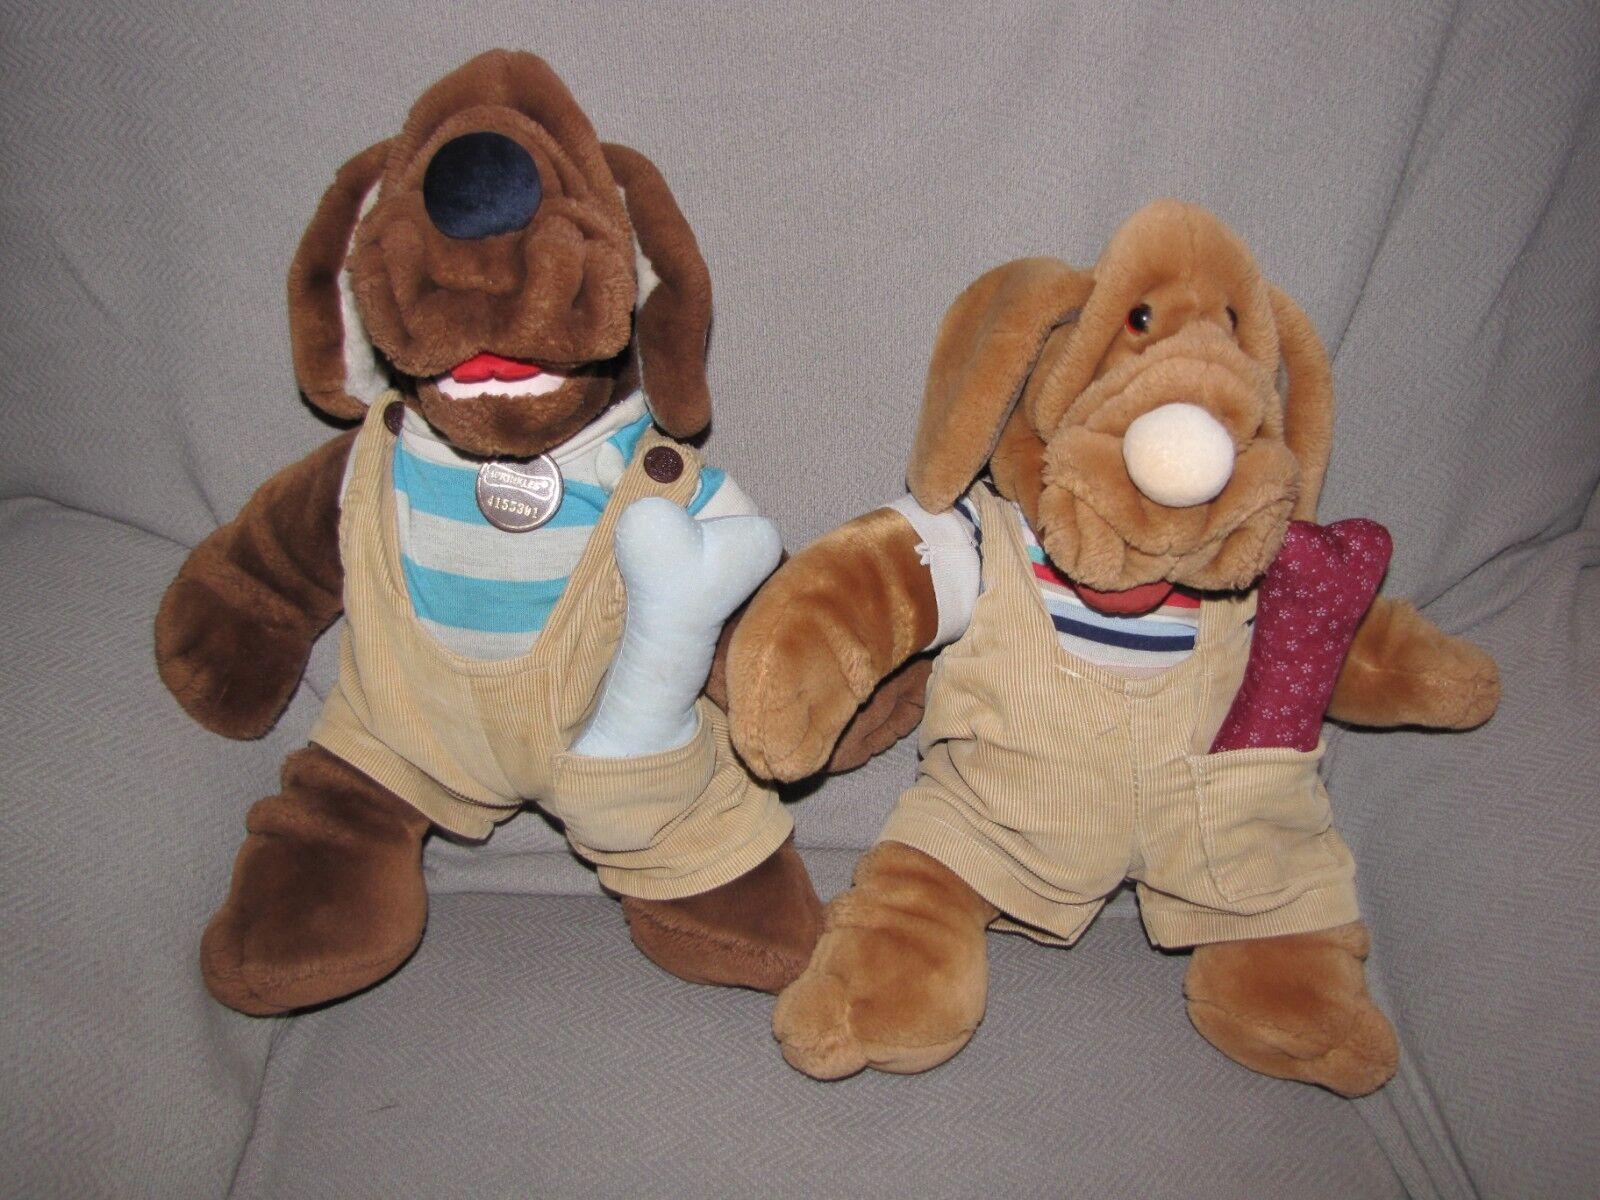 GANZ WRINKLES STUFFED PLUSH BOY DOG PUPPET LOT OF 2 CORDUROY OVERALLS BONES 1981